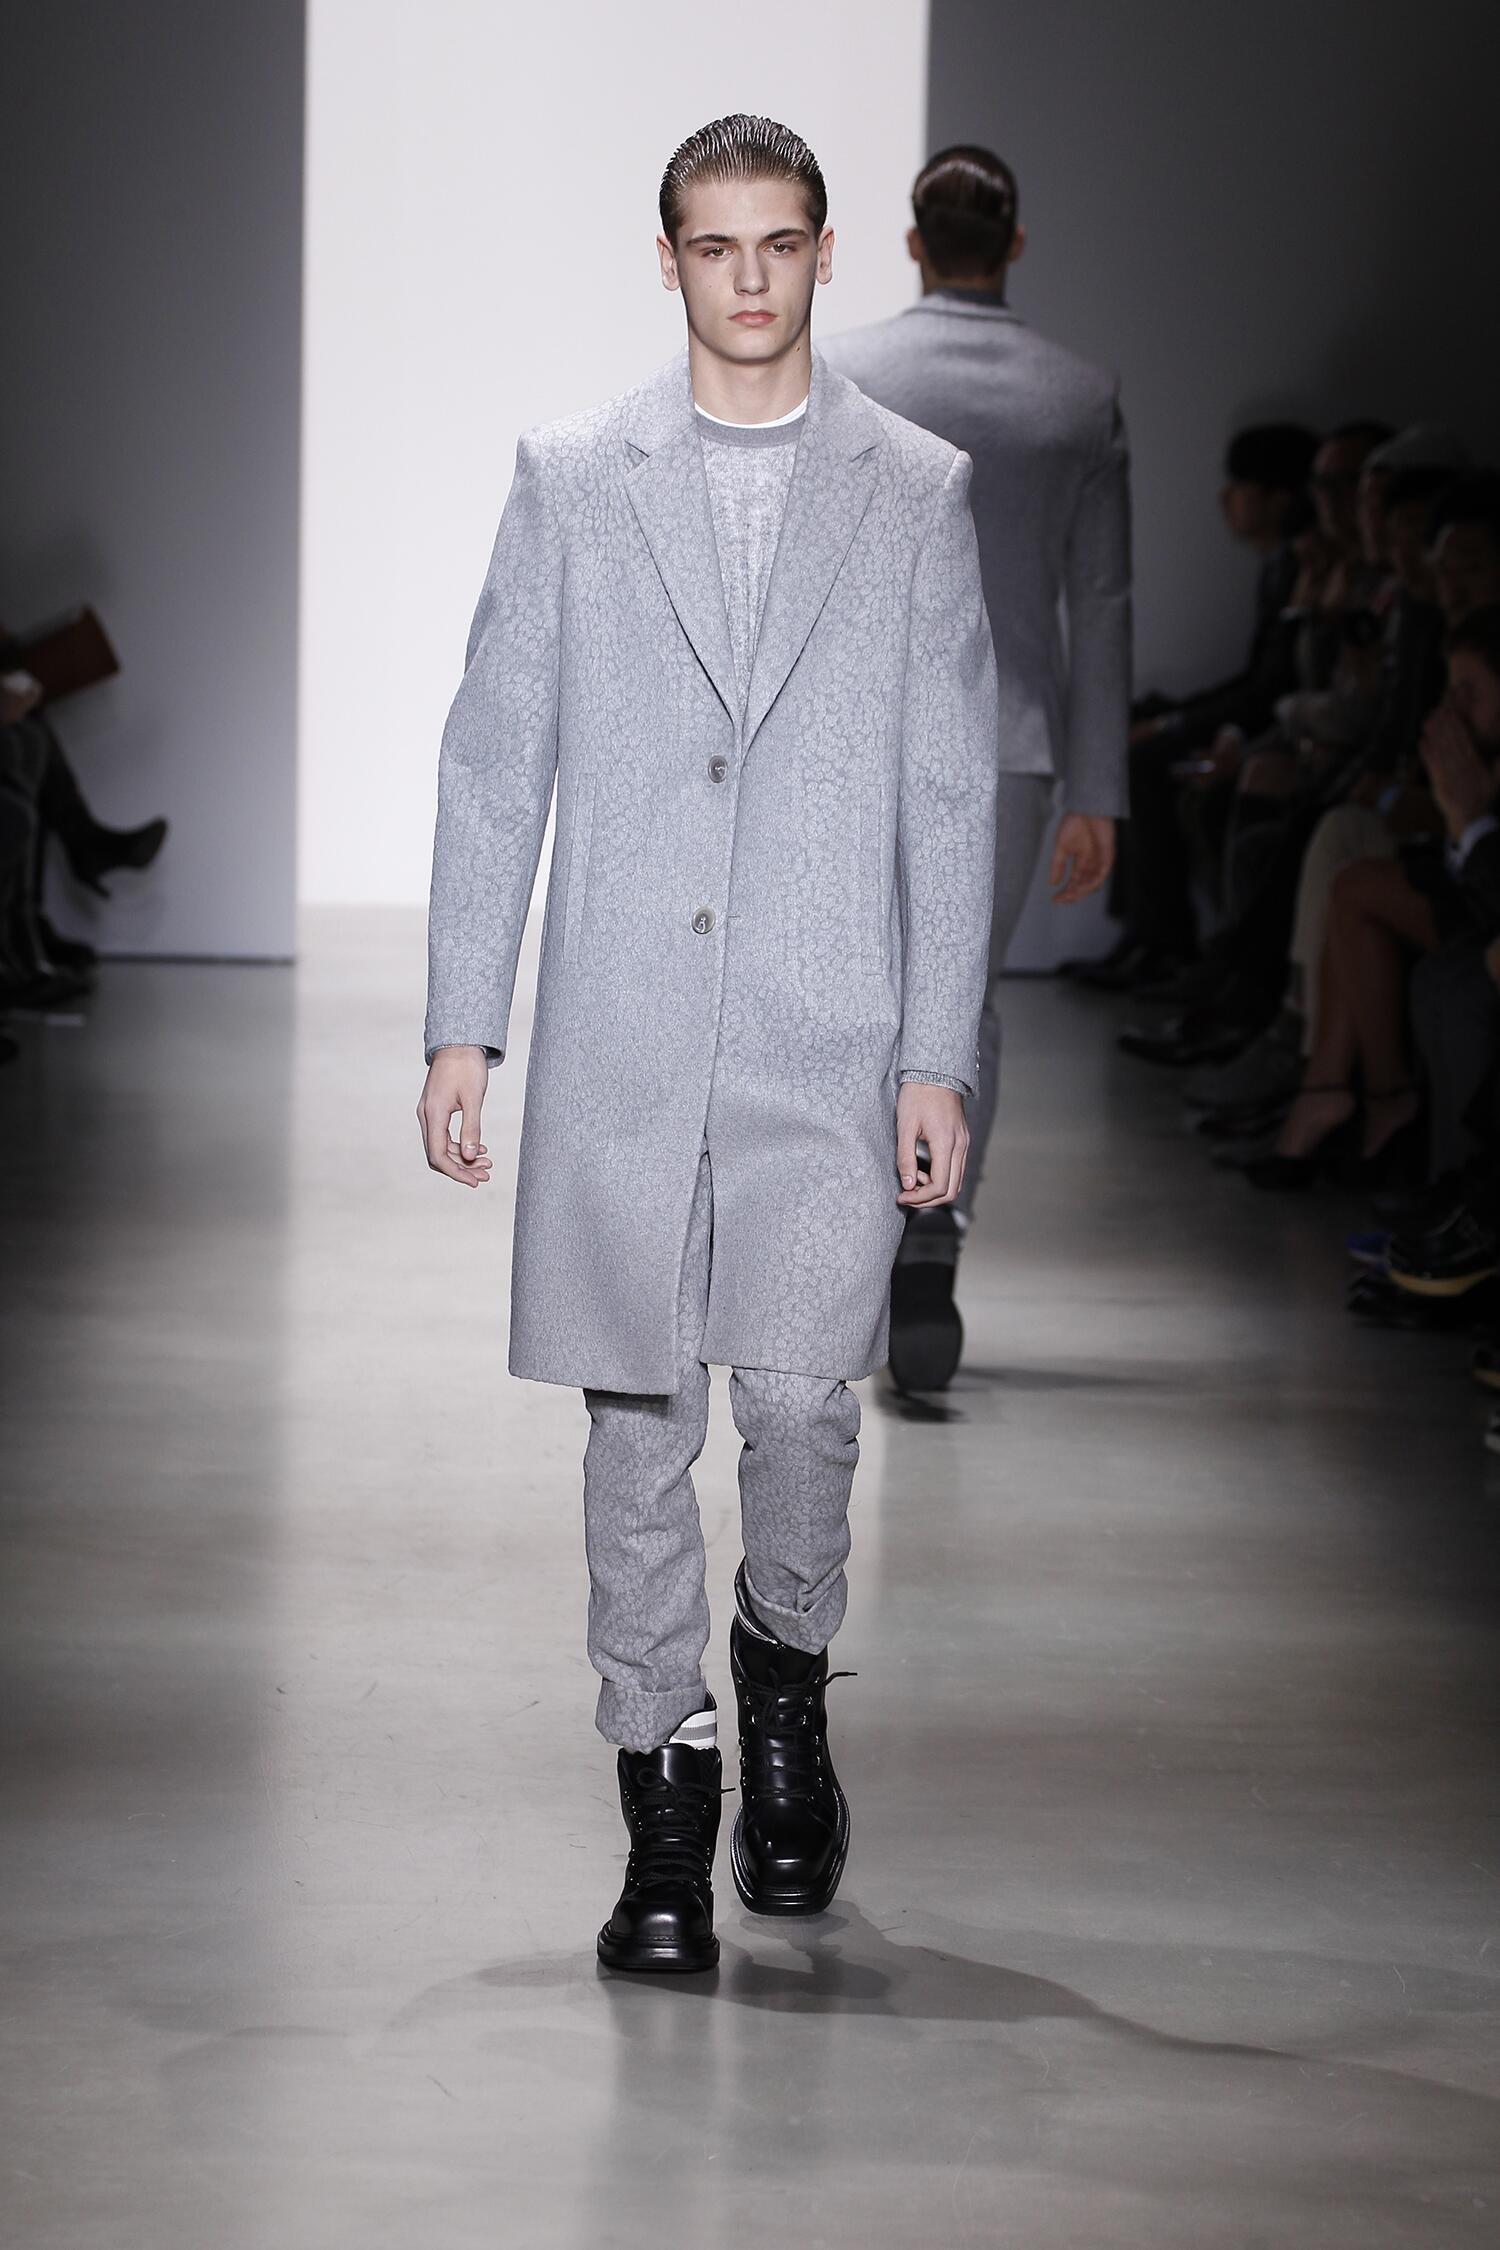 Winter 2015 Man Trends Calvin Klein Collection